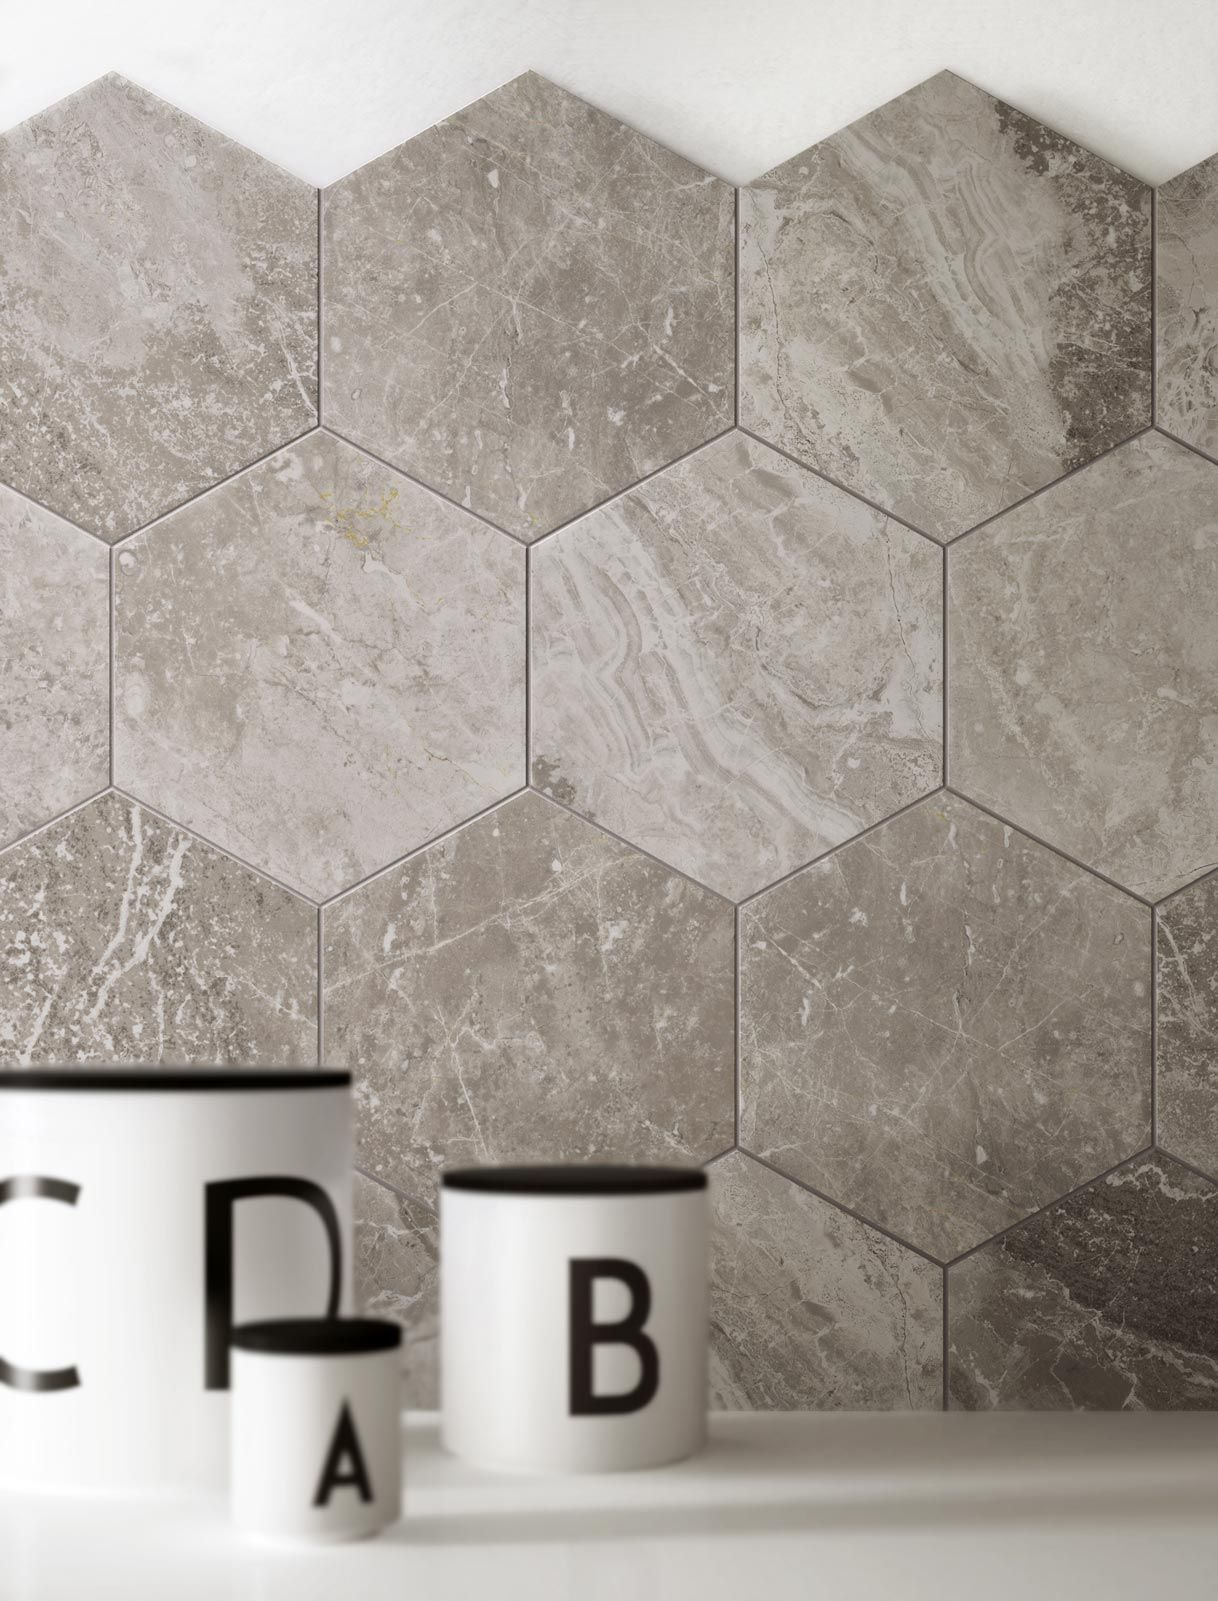 Ragno bistrot piastrelle cucina   Cucina in 2019   Pinterest   Tiles ...